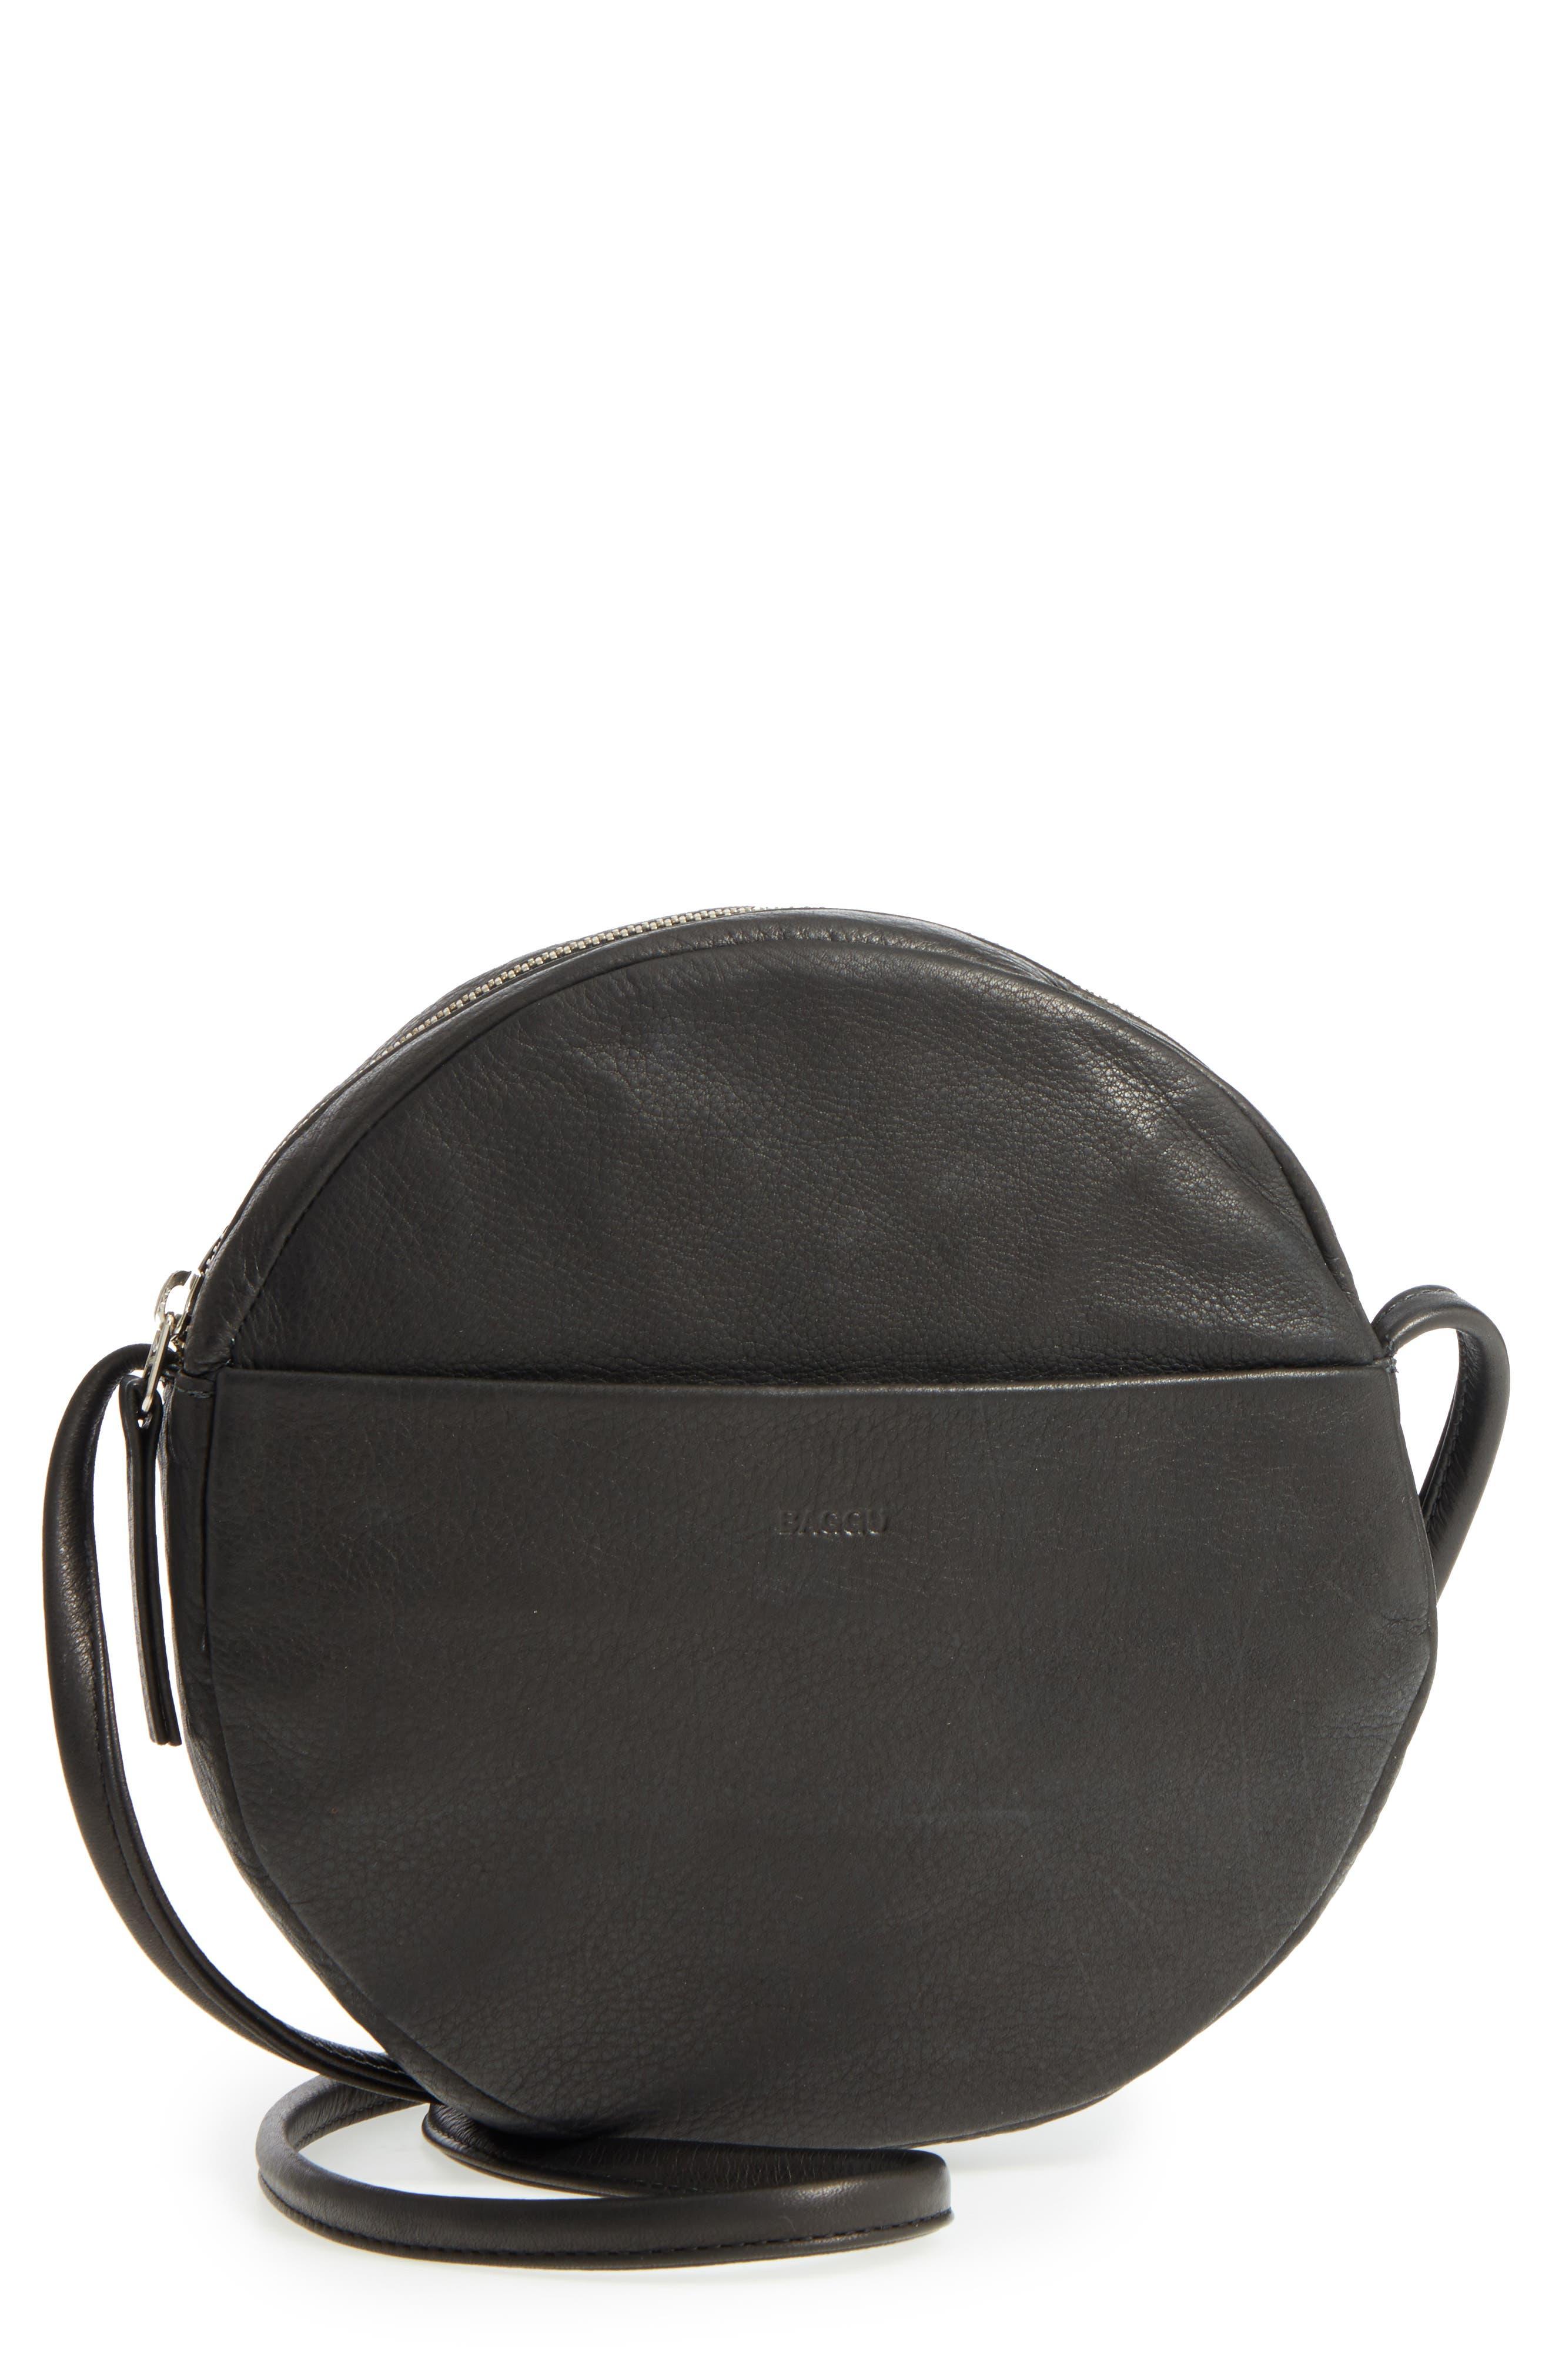 Circle Calfskin Leather Crossbody Bag,                             Main thumbnail 1, color,